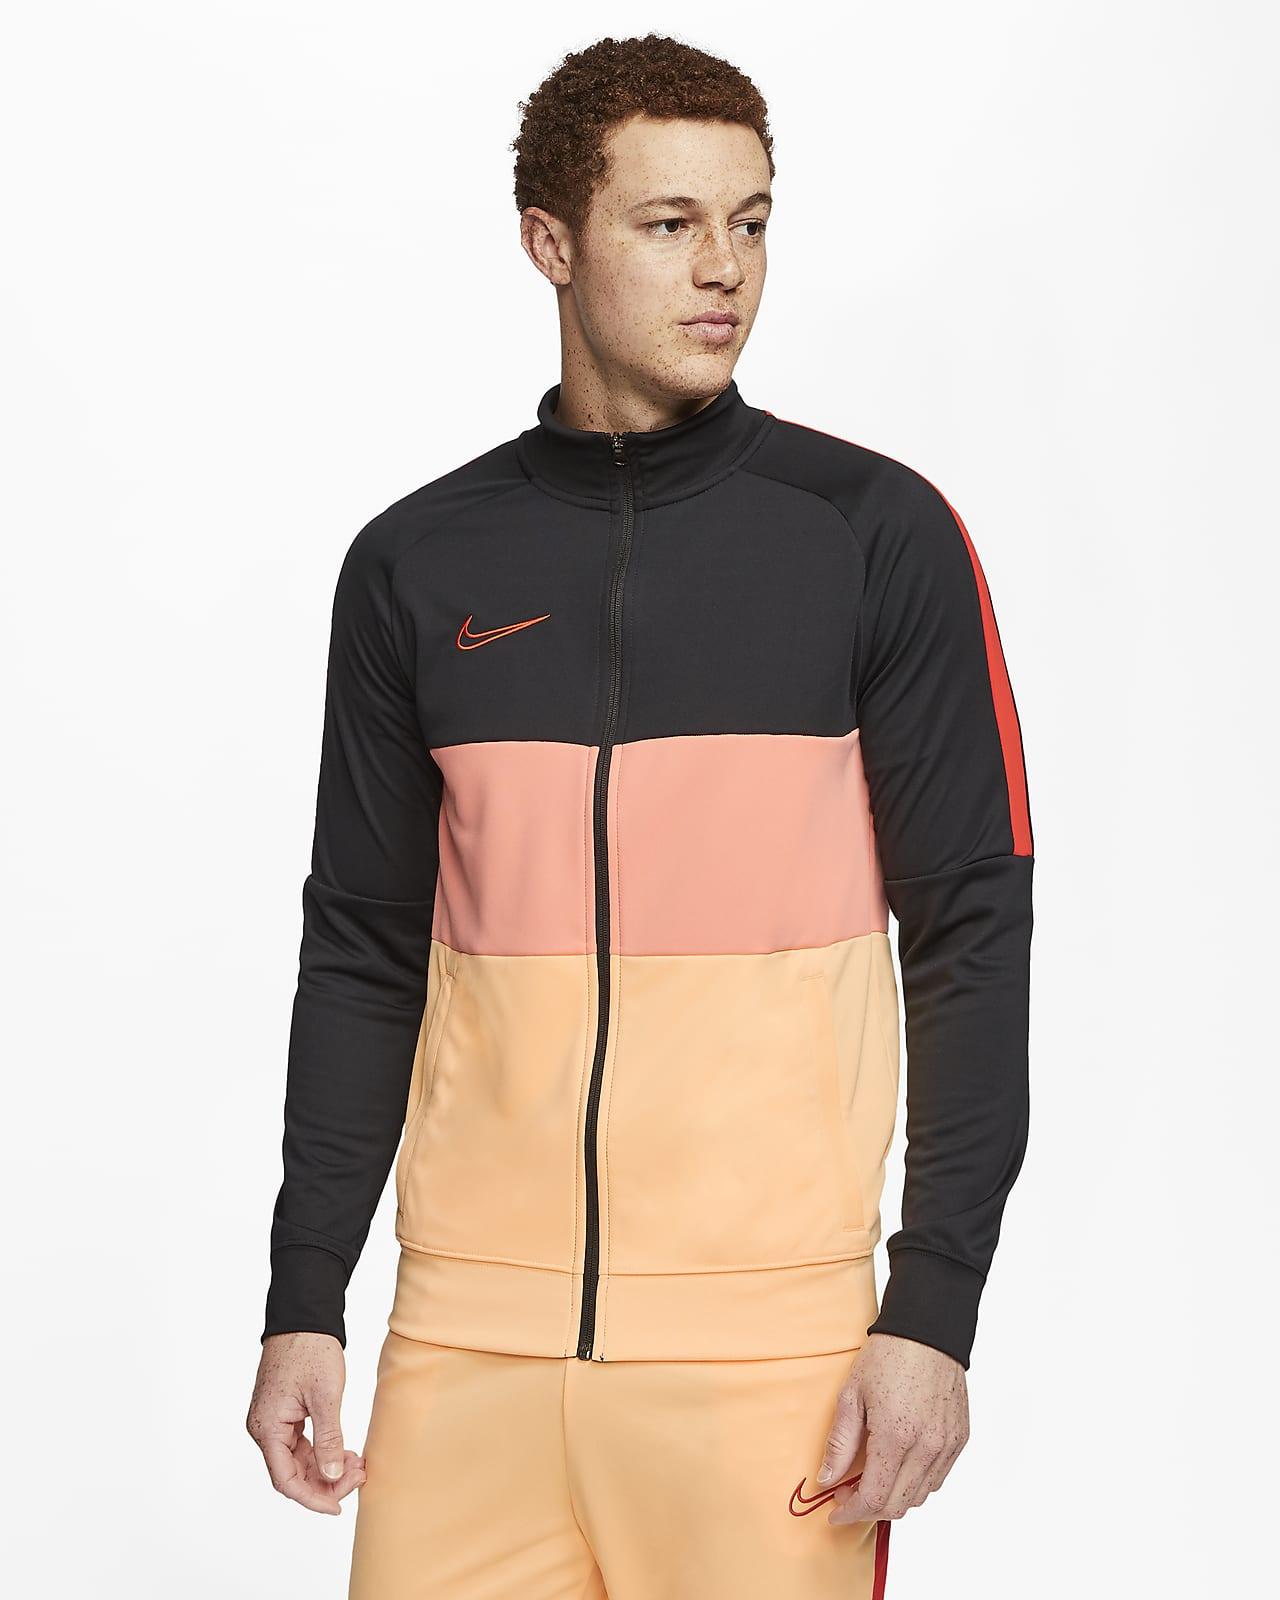 Nike Dri-FIT Academy Germany férfi futballkabát